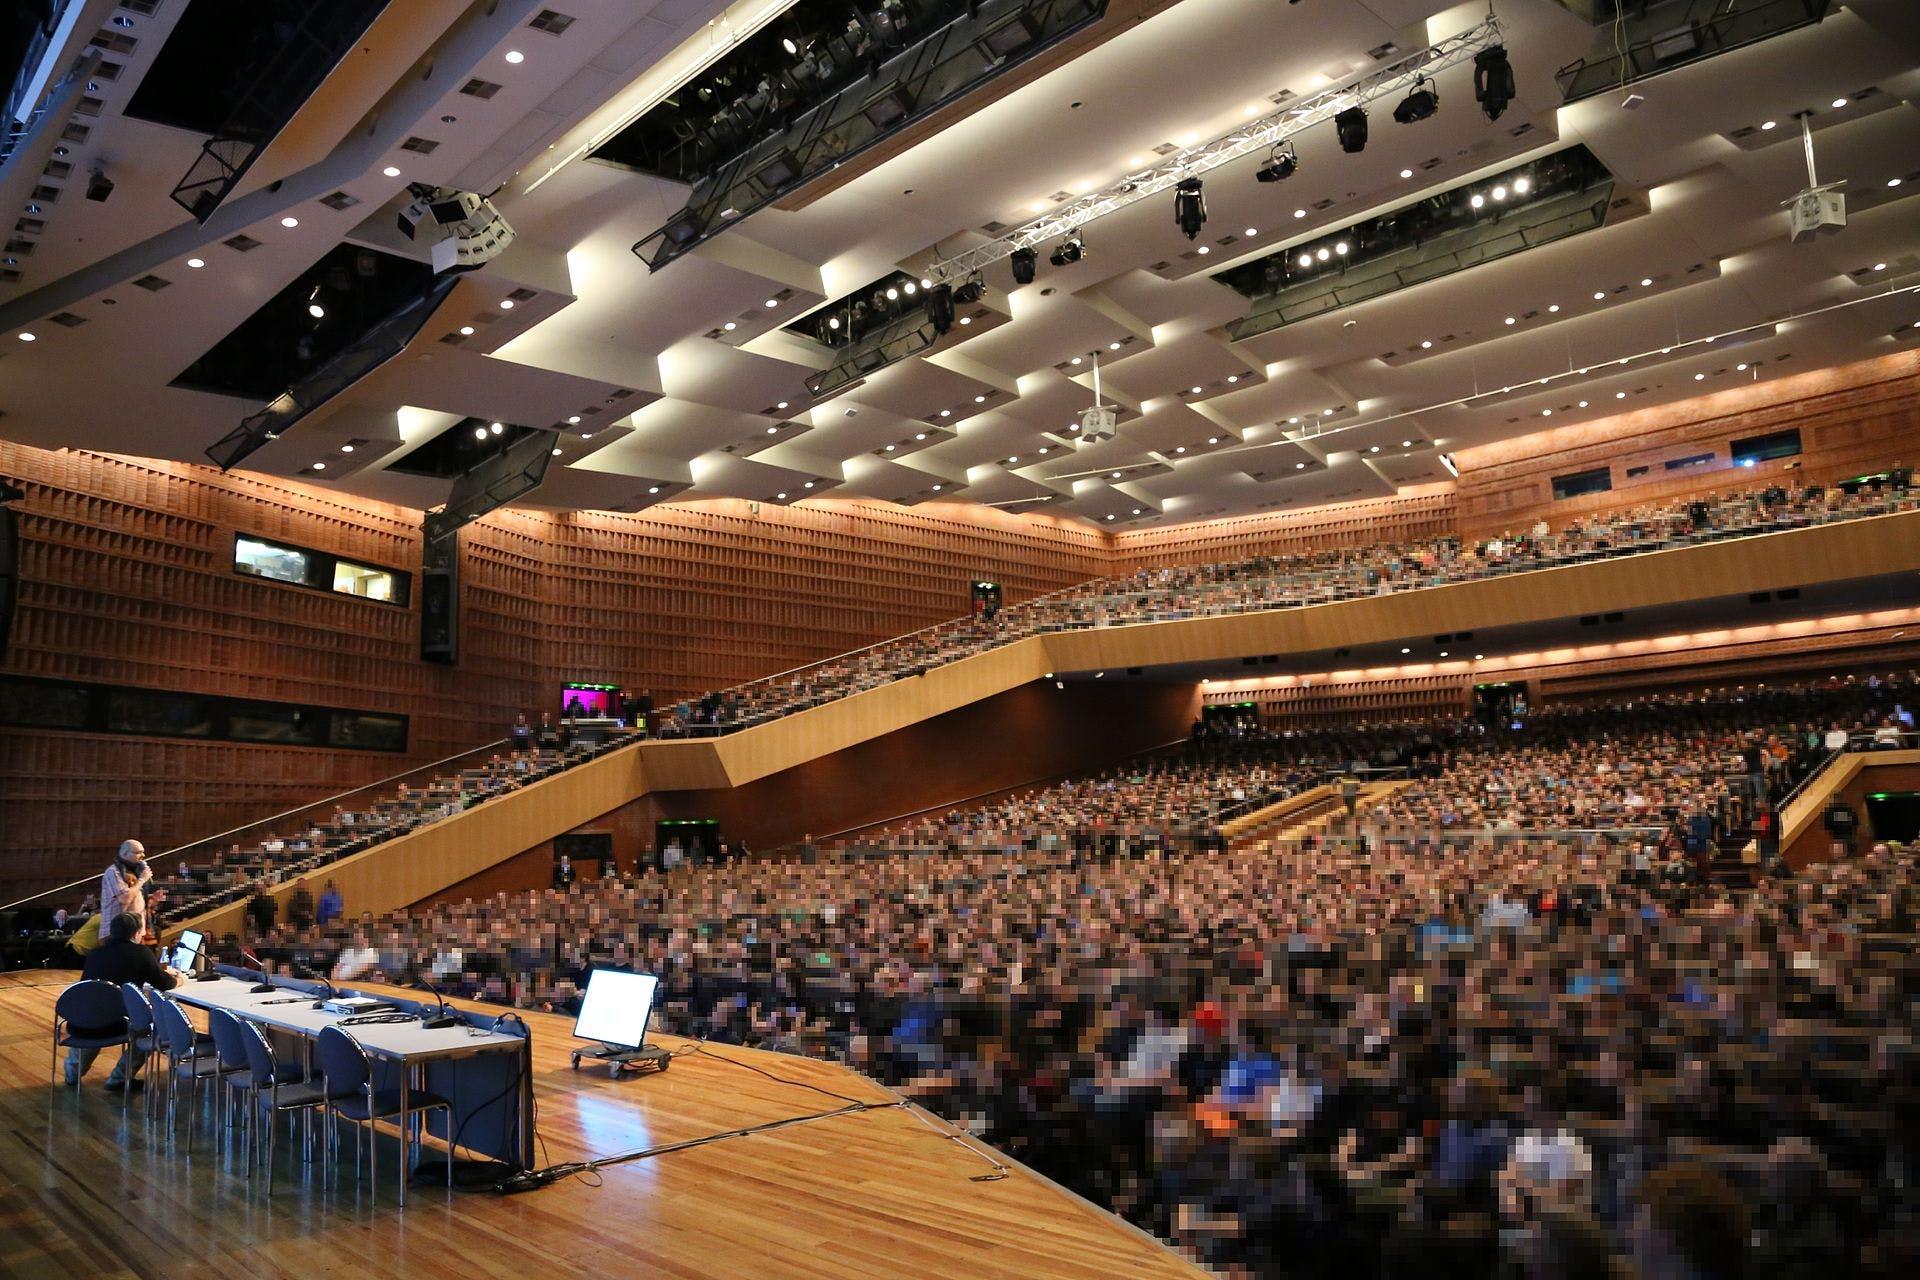 Glenn Greenwald's keynote at the 30th Chaos Communication Congress in Hamburg, 2013